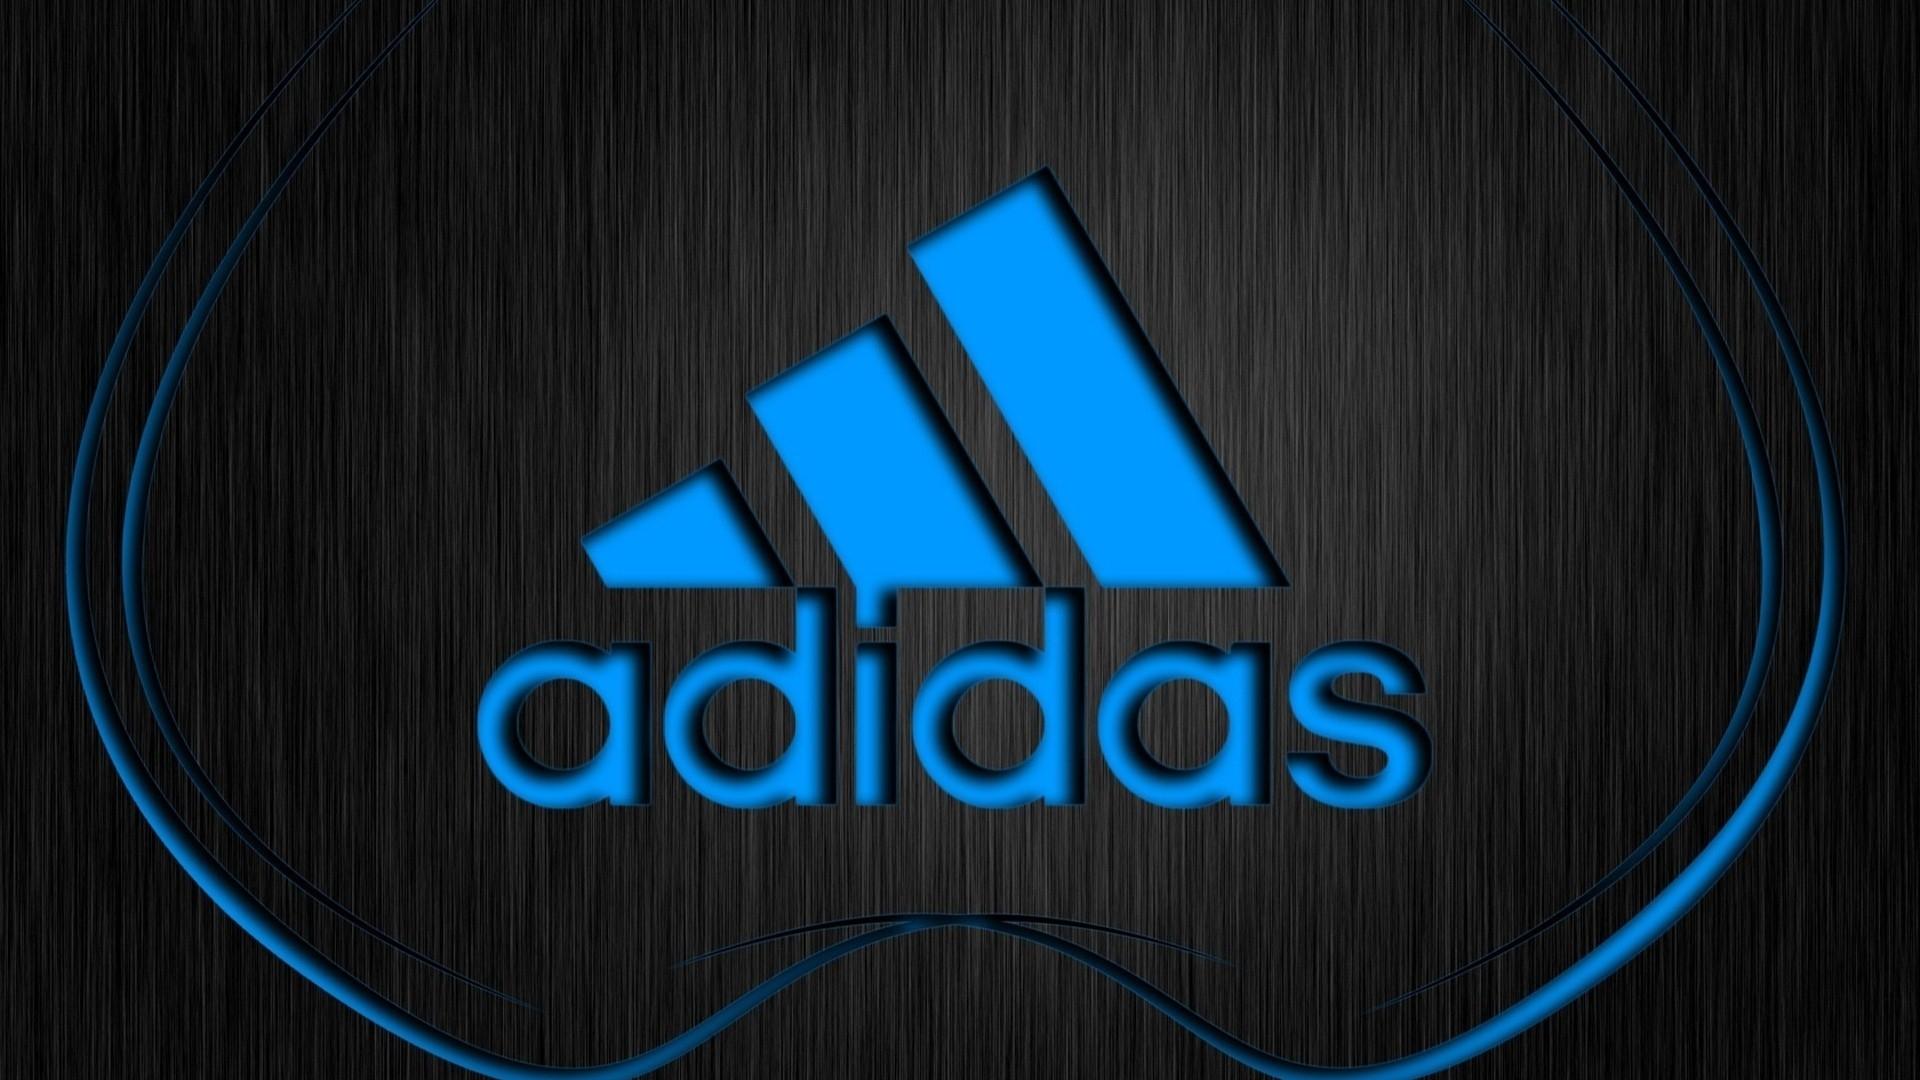 Adidas logo wallpaper 2016 wallpapersafari adidas wallpaper hd 1920x1080 voltagebd Gallery